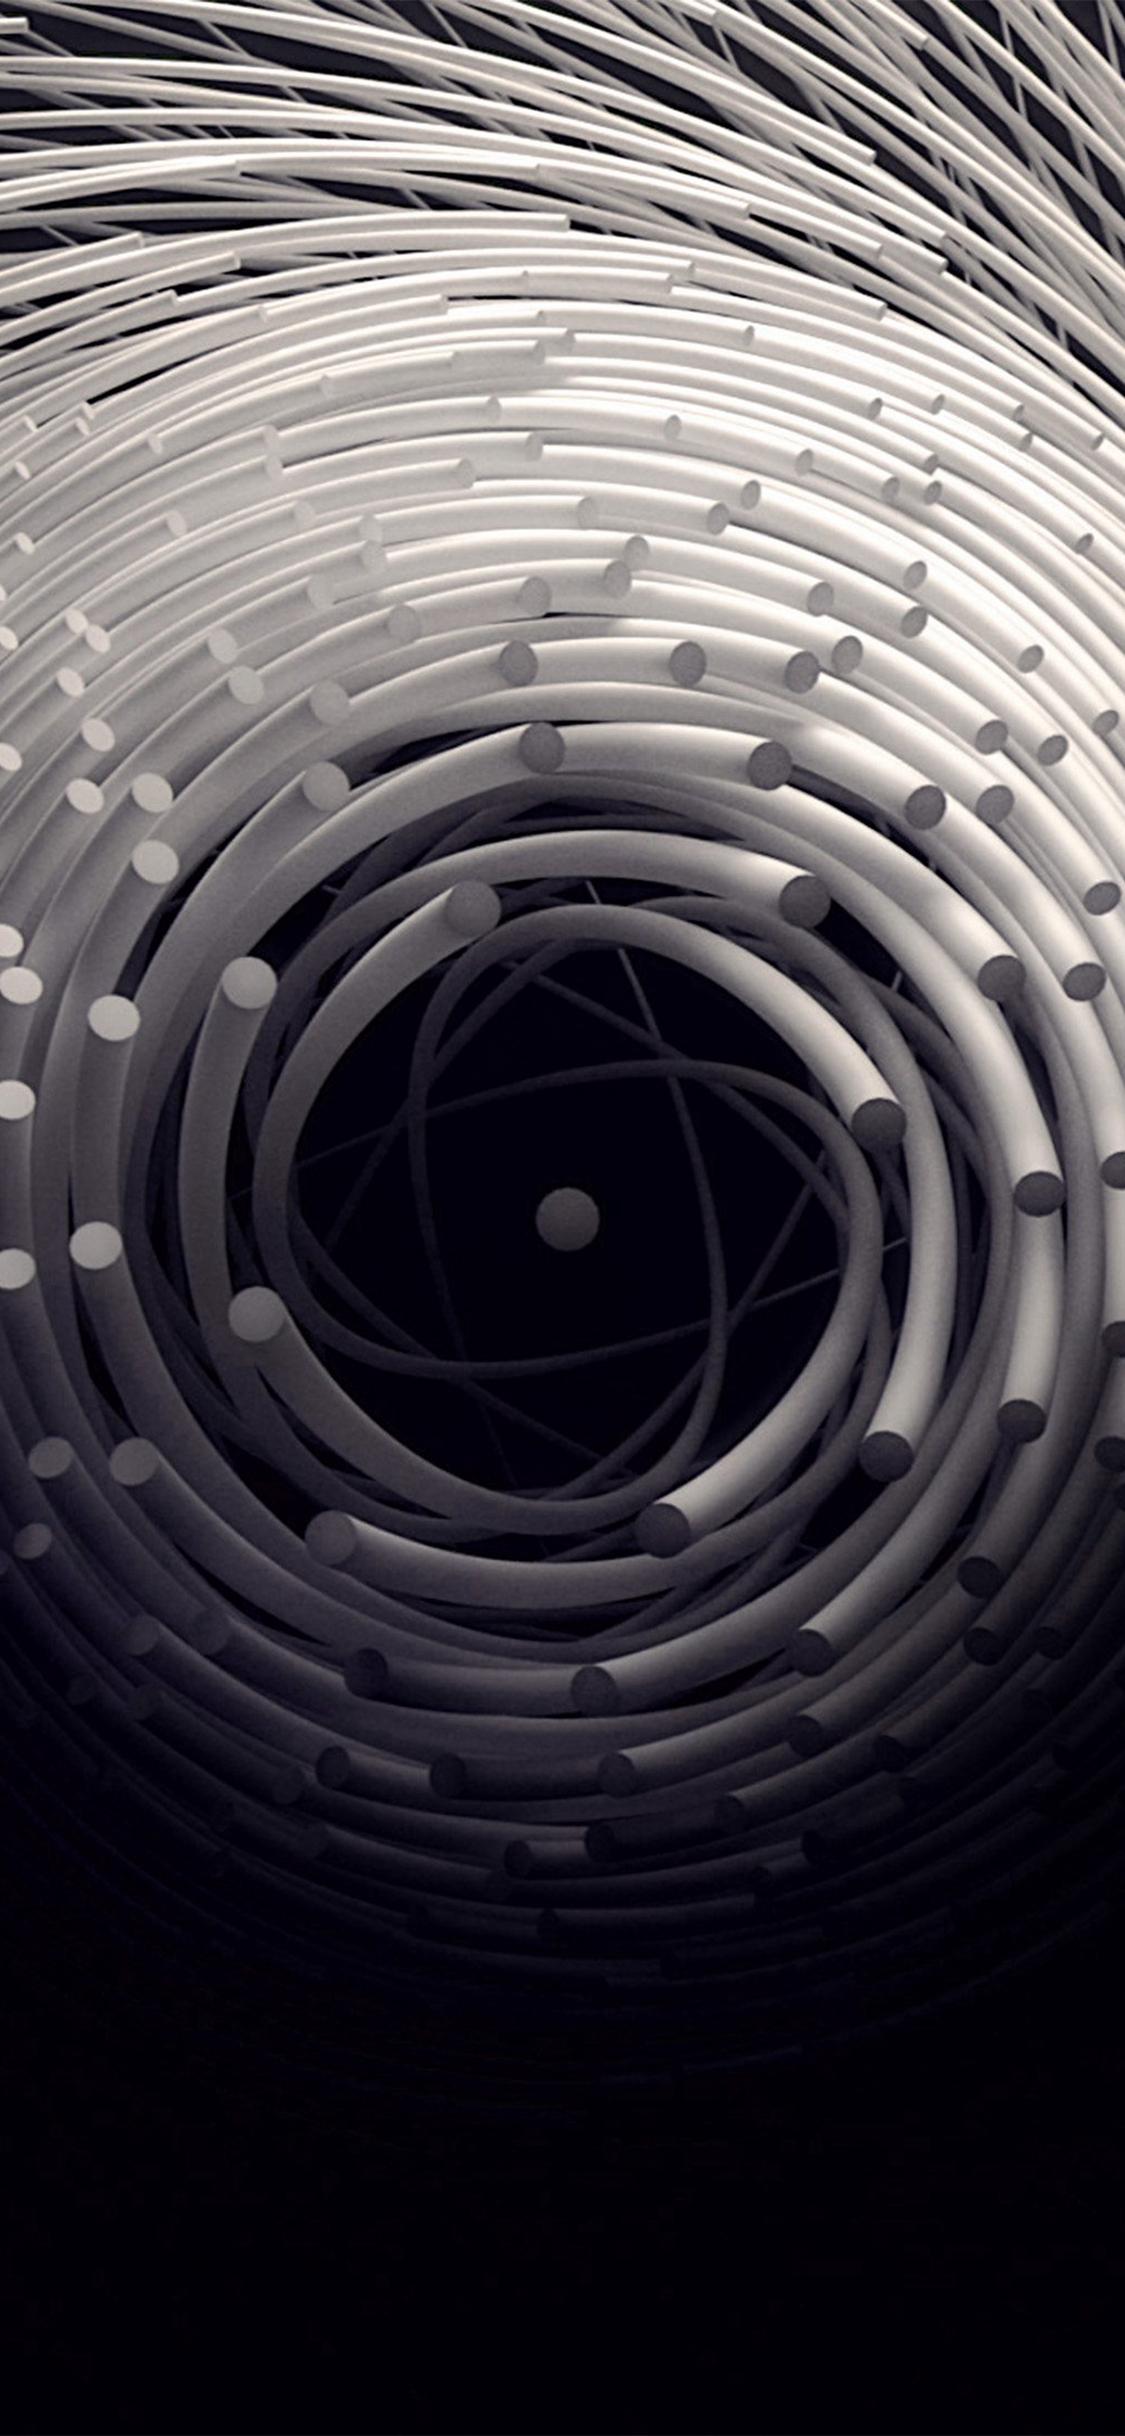 Circle 3d Dark Abstact Illustration Art Iphone X Wallpapers